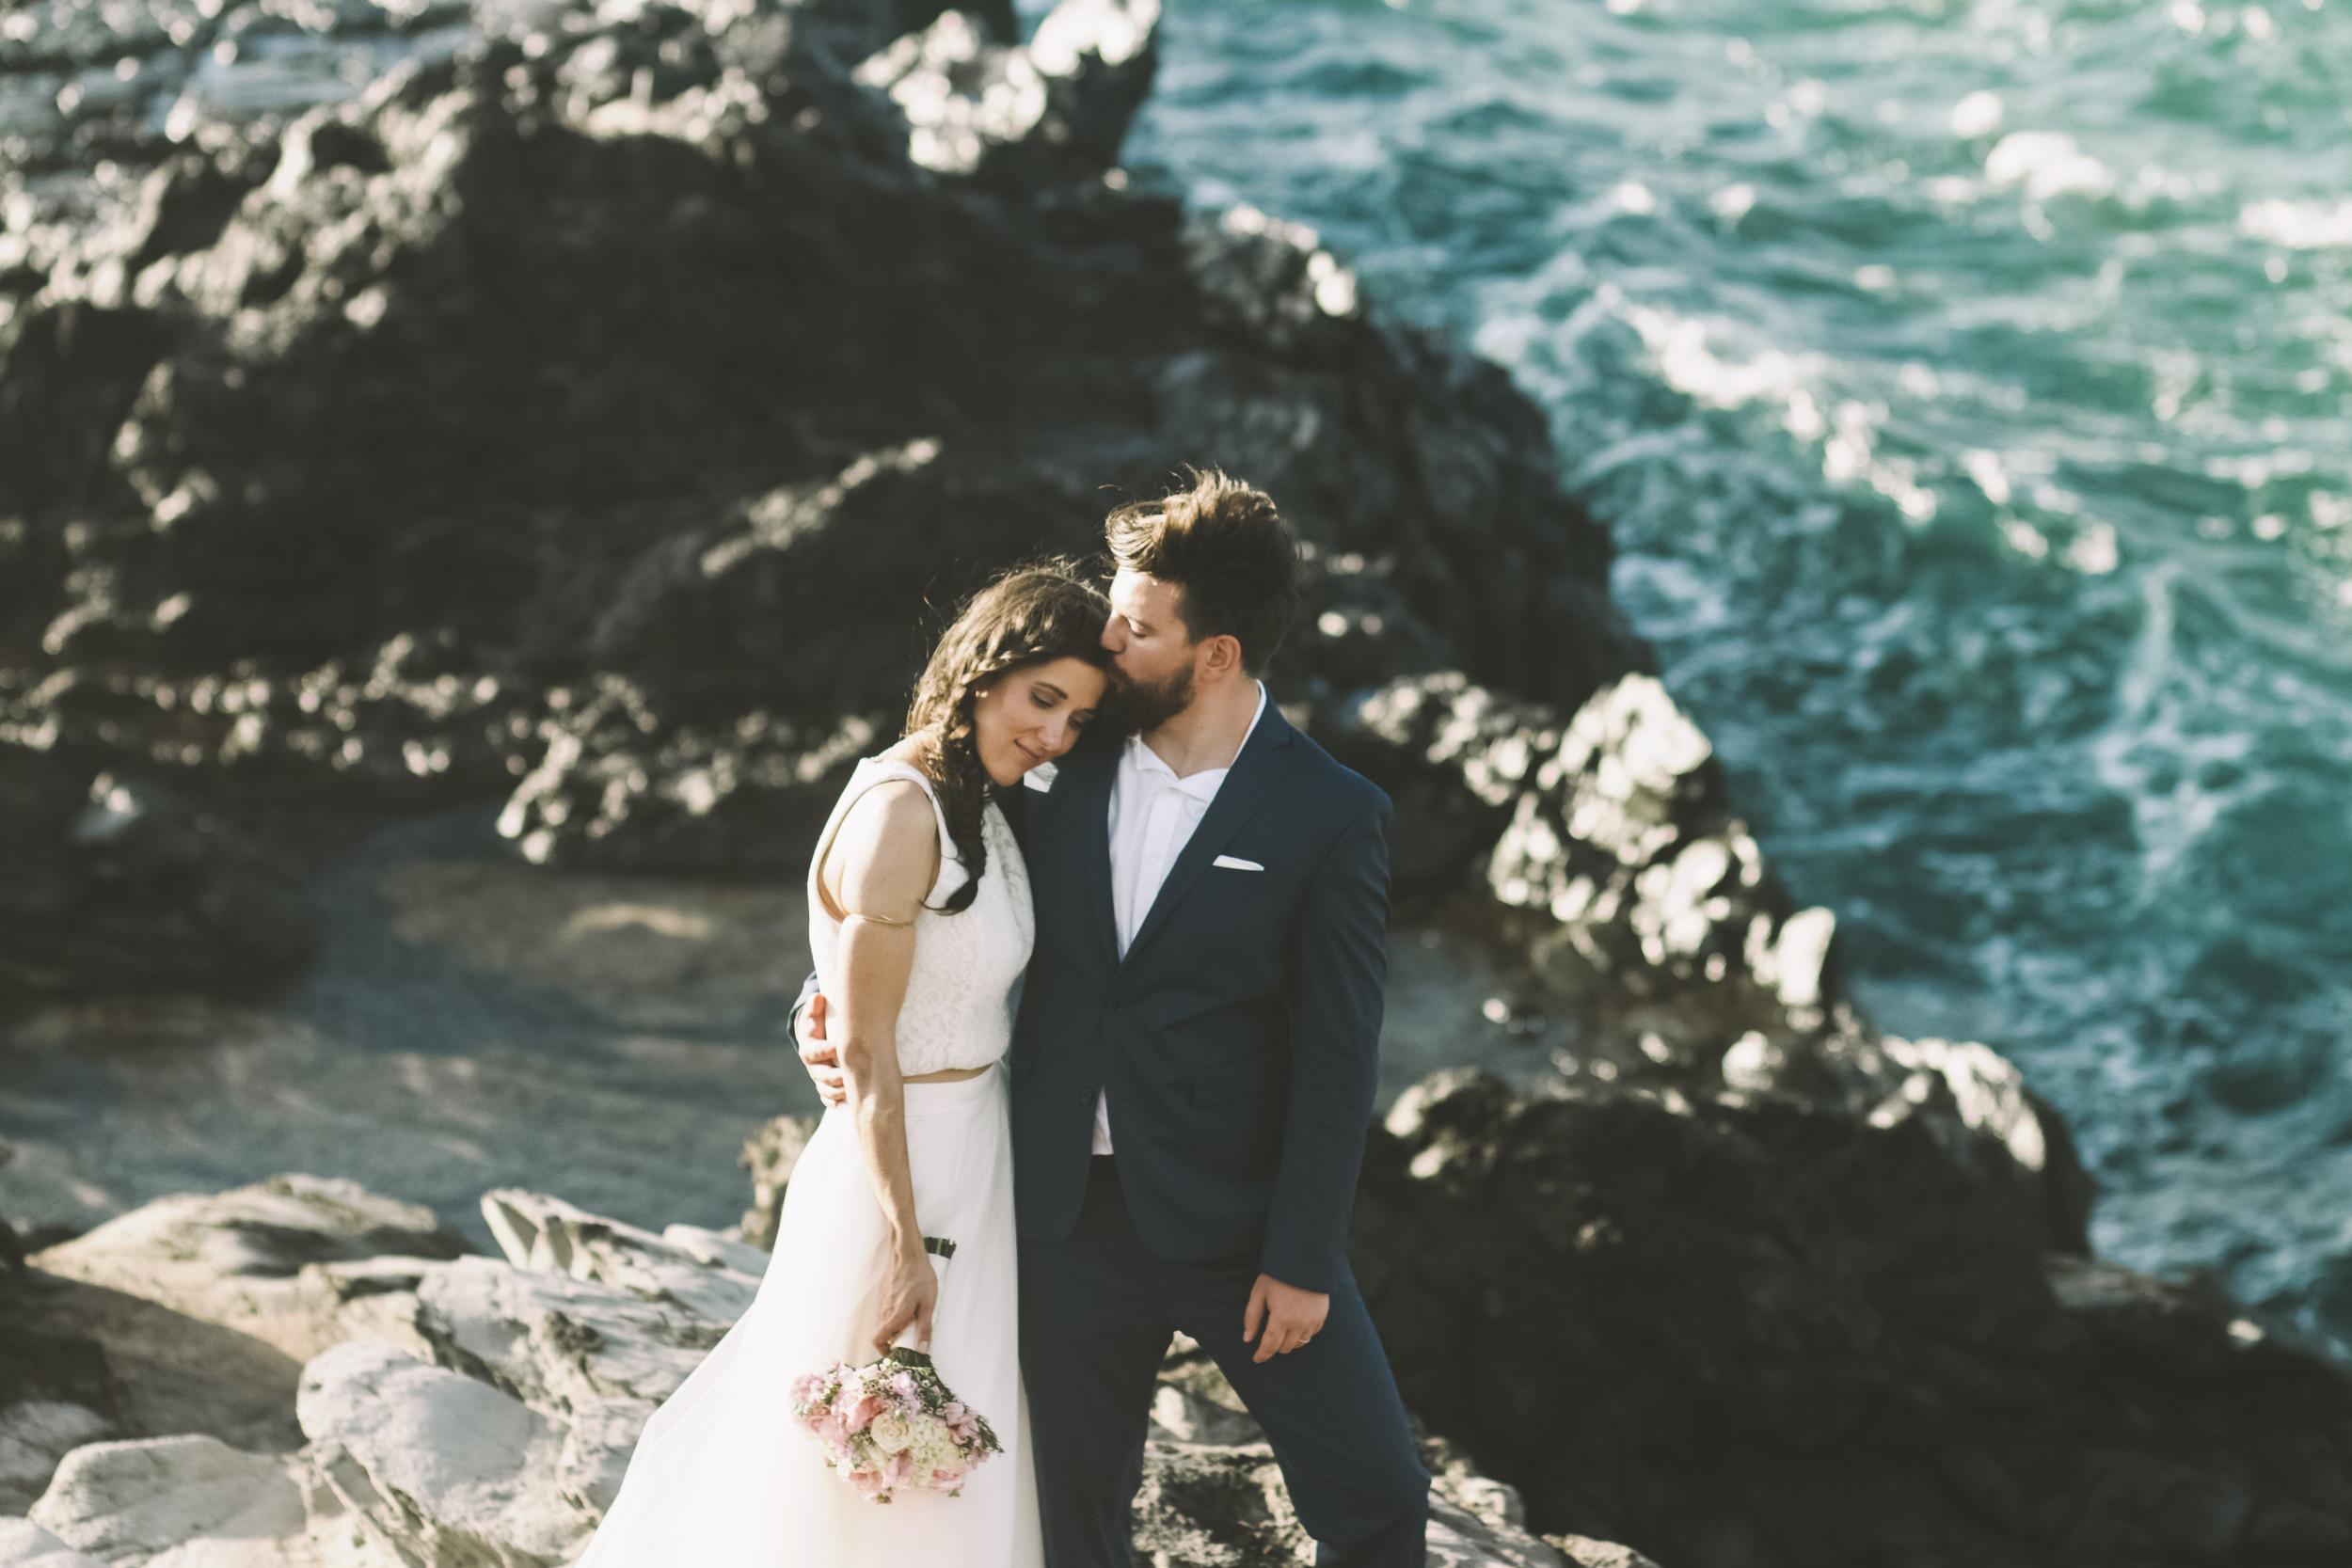 angie-diaz-photography-maui-wedding-ironwoods-beach-57.jpg